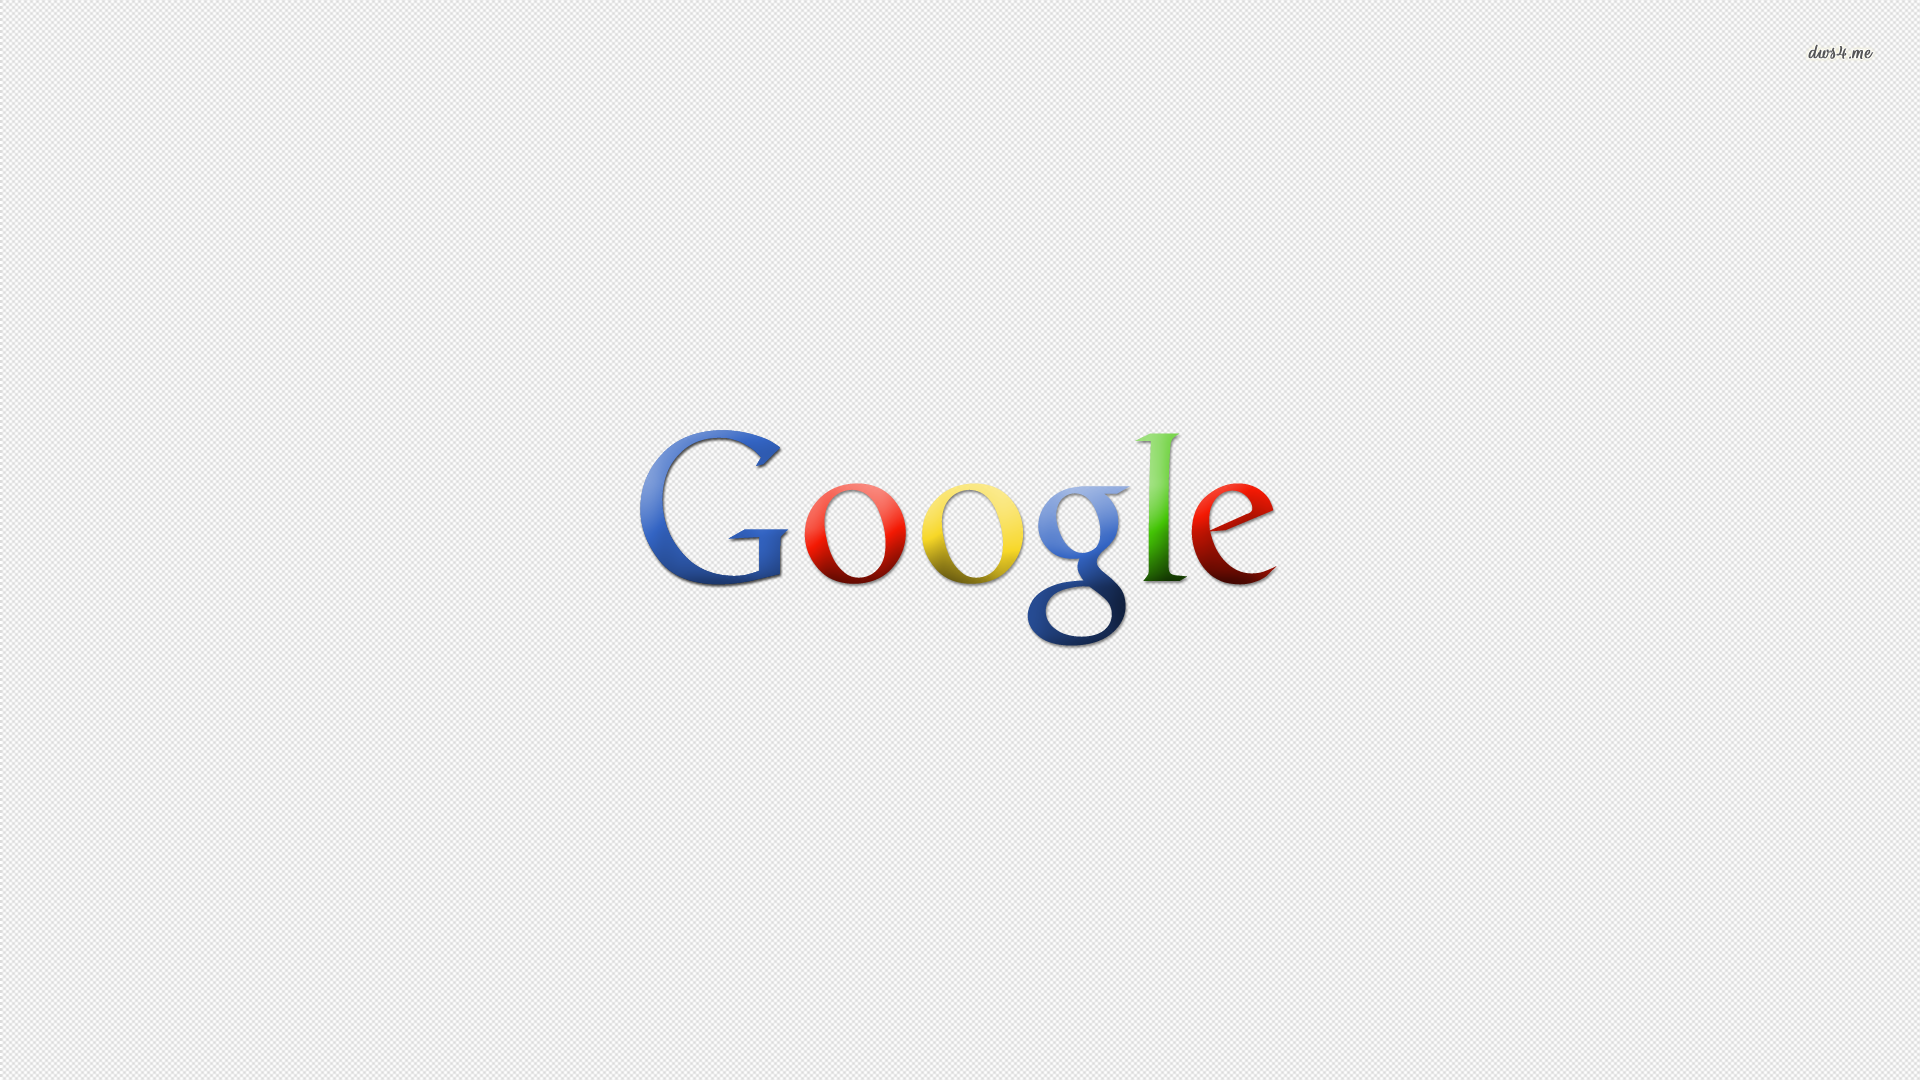 Google wallpaper   Computer wallpapers   7777 1920x1080